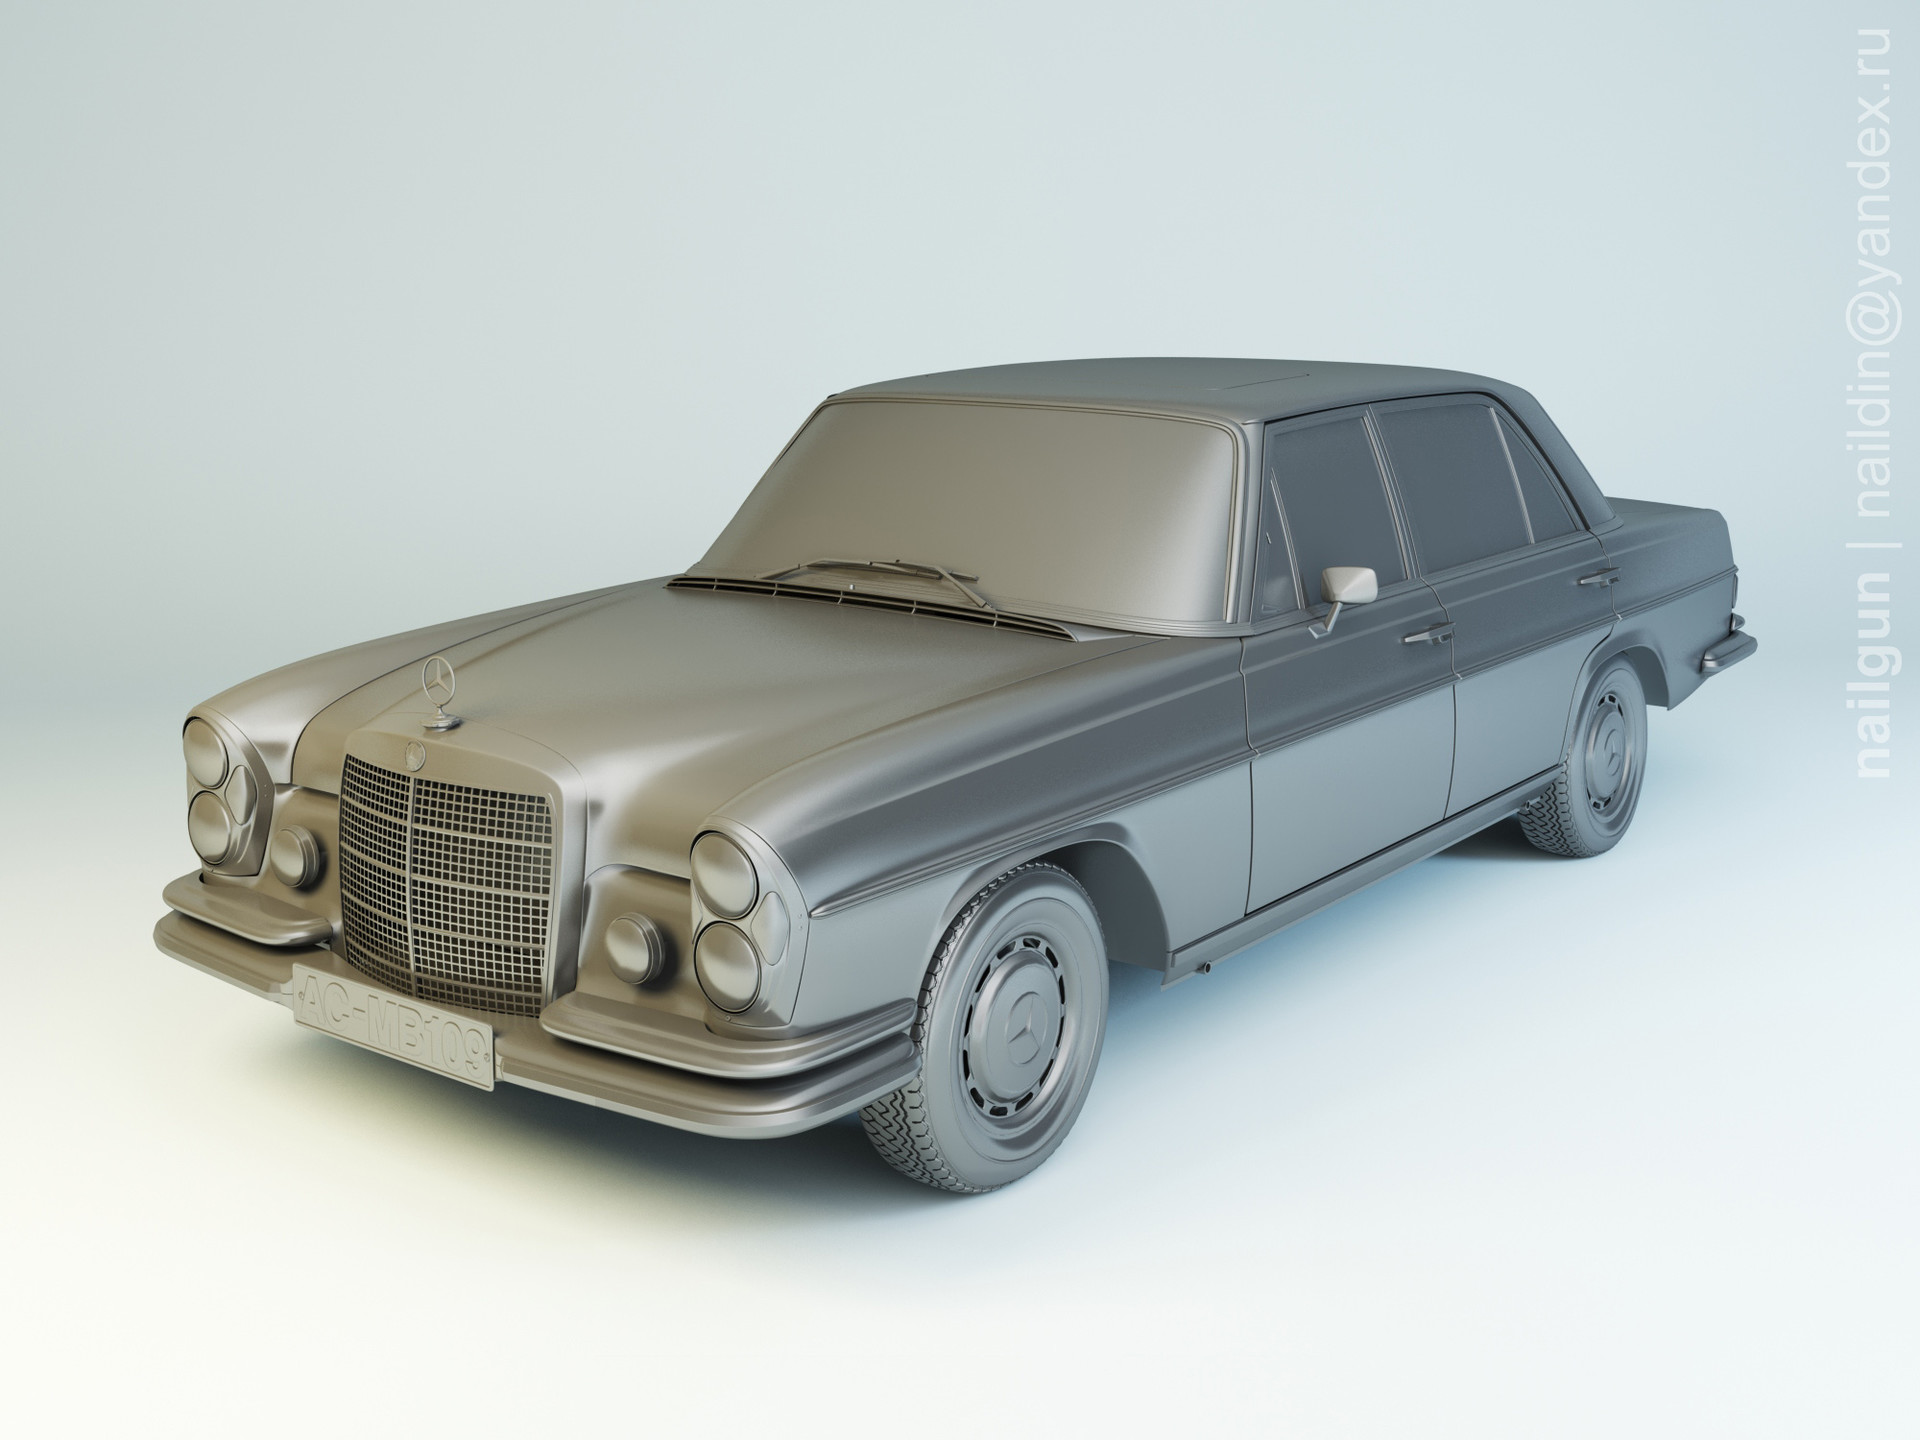 Nail khusnutdinov pwc 077 002 mercedes w109 modelling 0